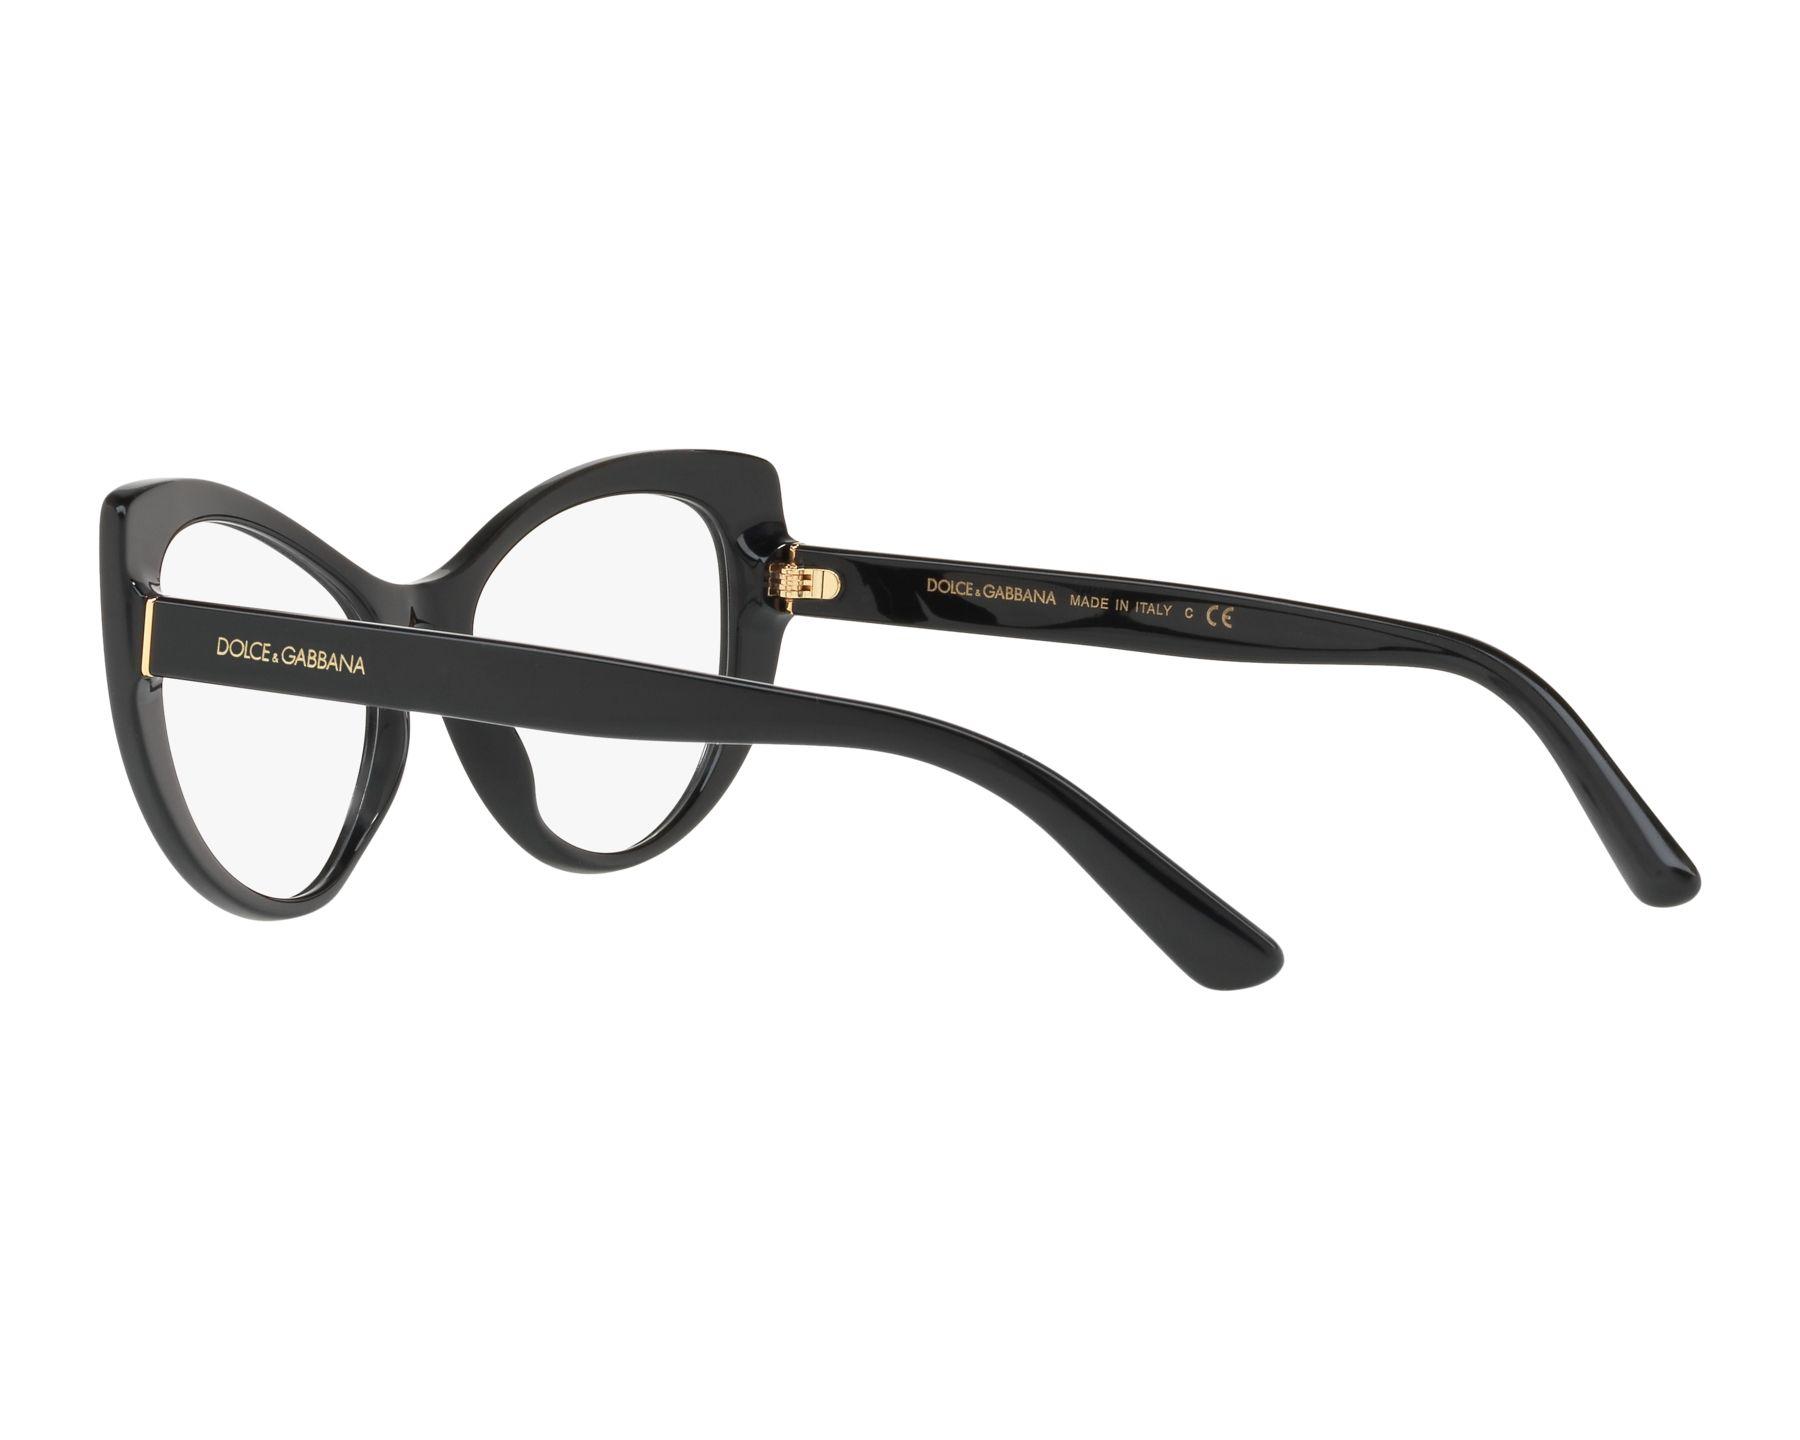 856c27d555e9 eyeglasses Dolce   Gabbana DG-3285 501 52-17 Black 360 degree view 5